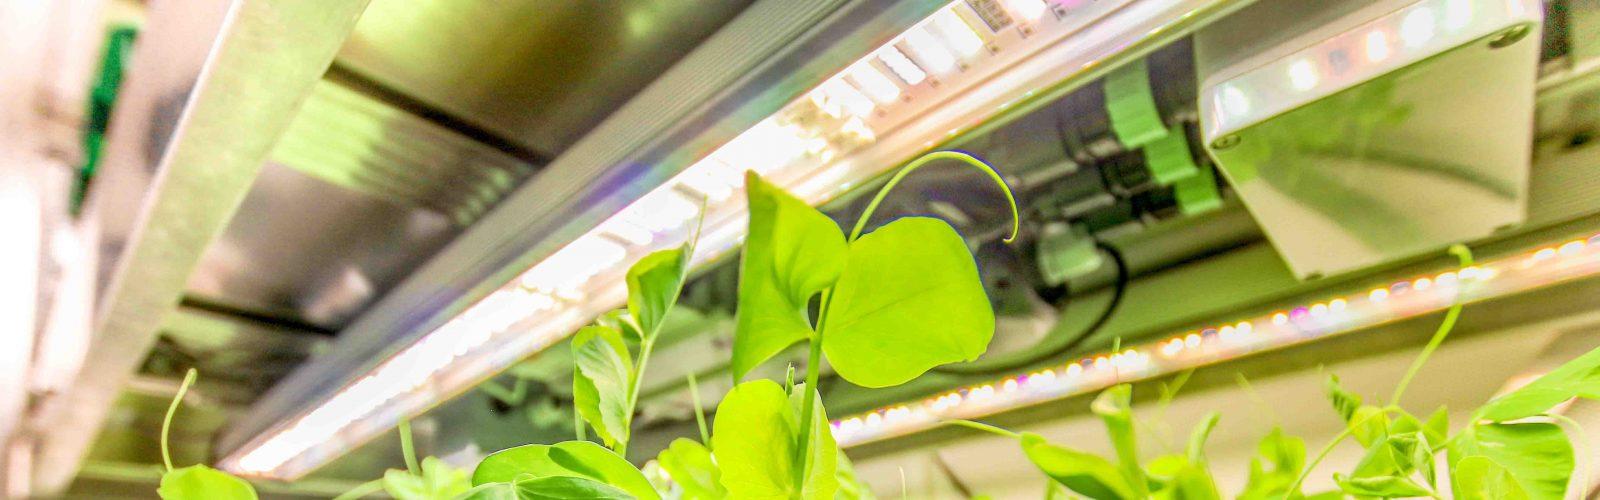 valoa-LED-growth-room 9